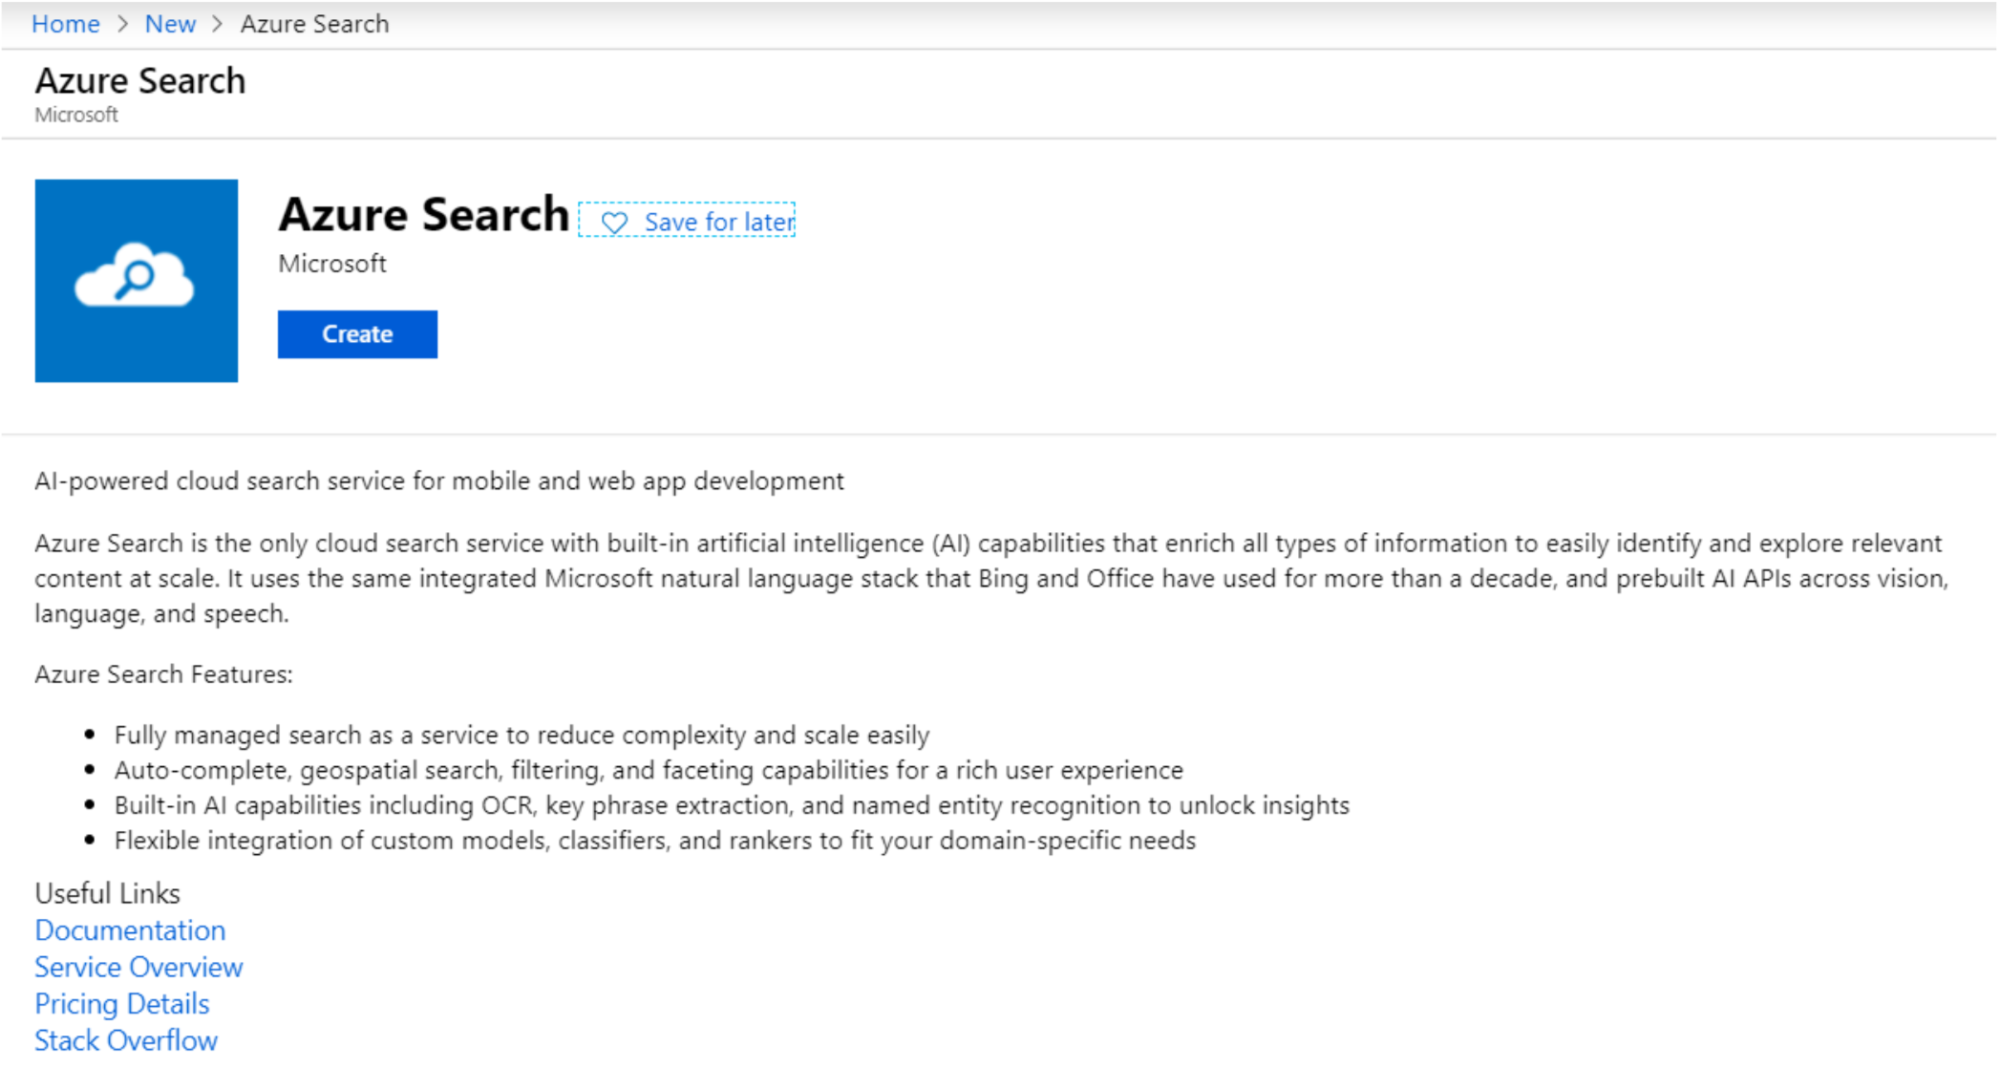 Enable Azure Search